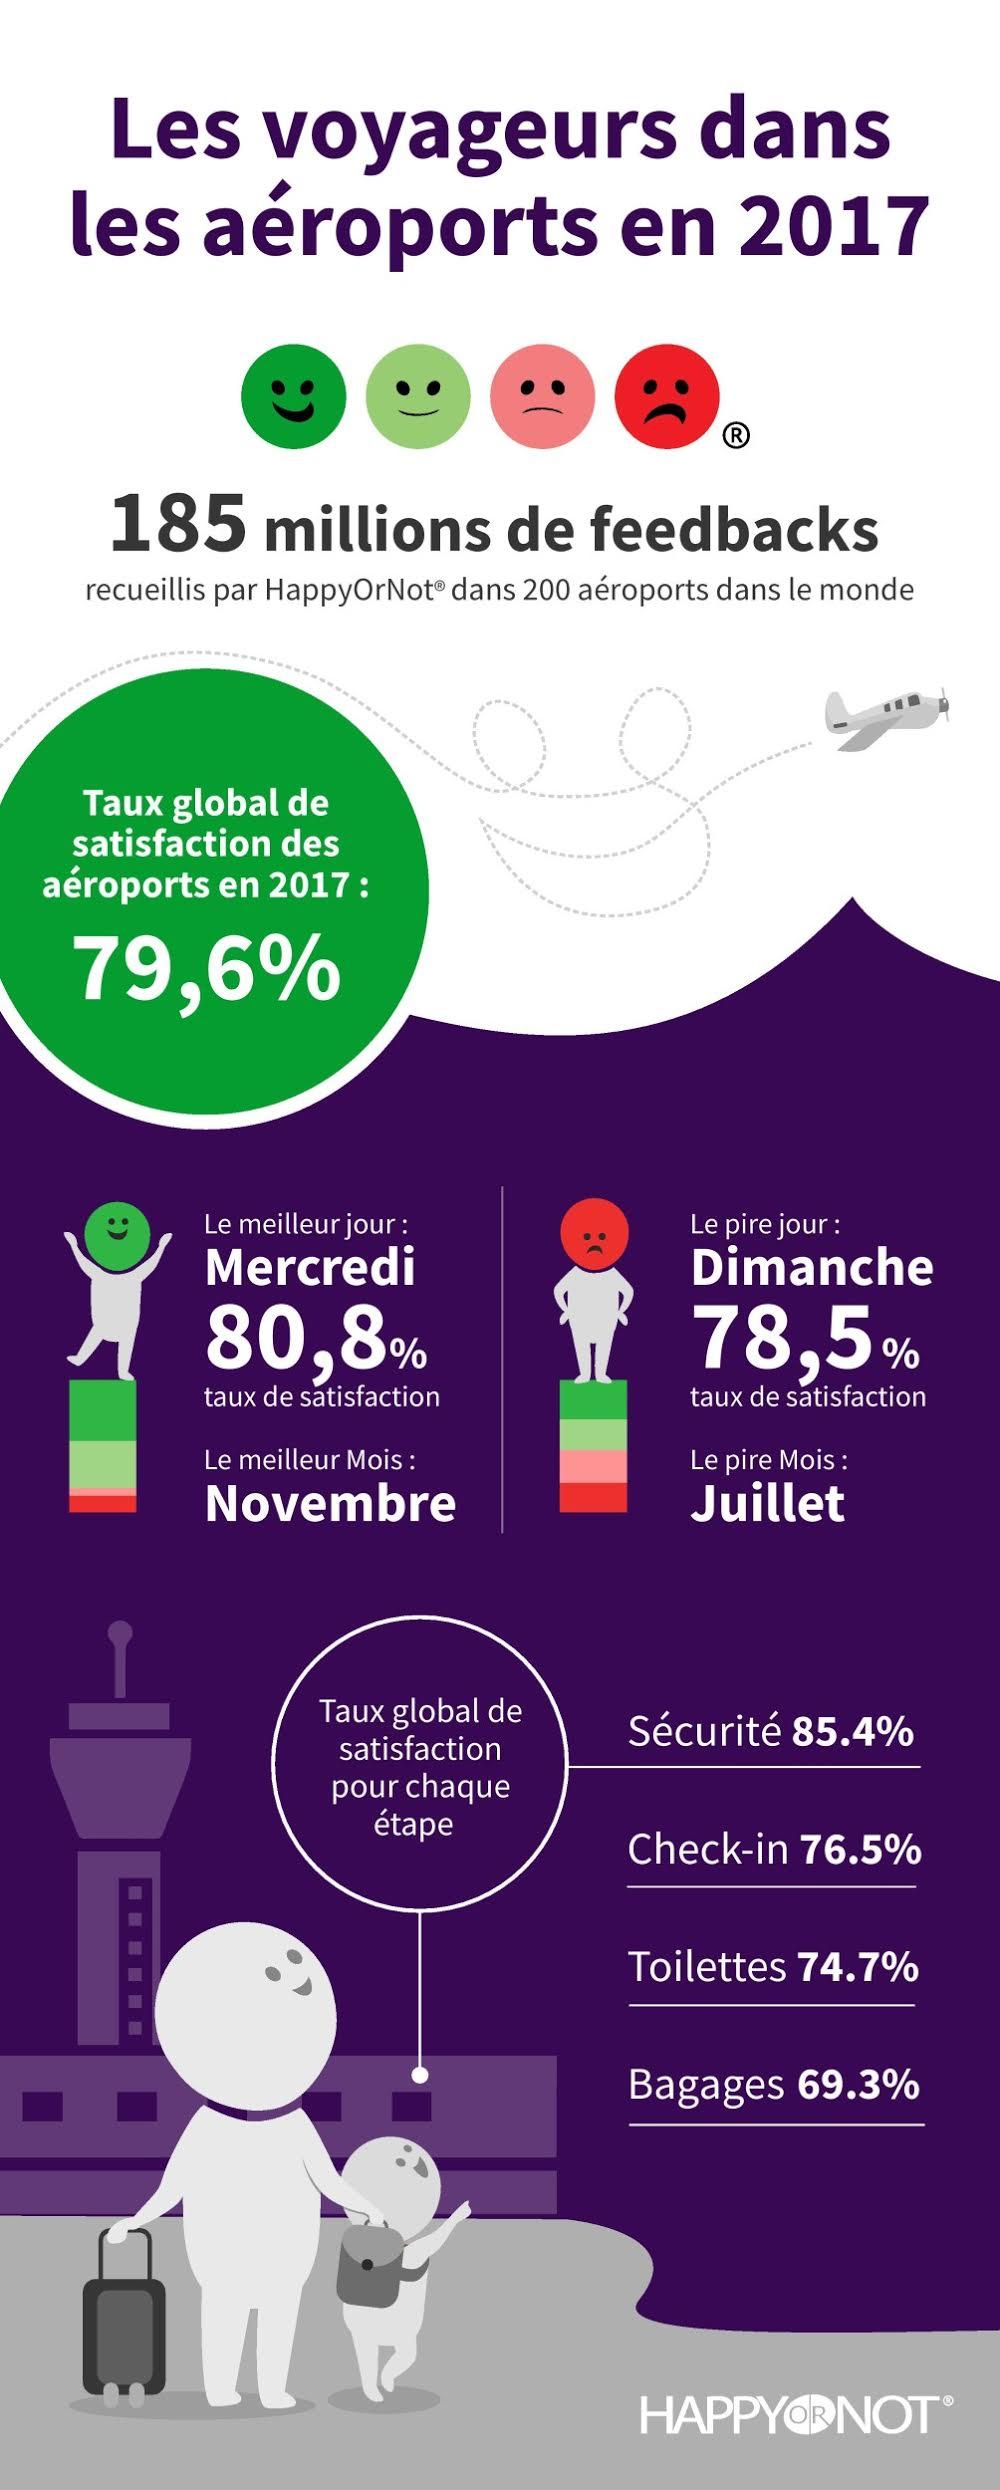 infotravel.fr